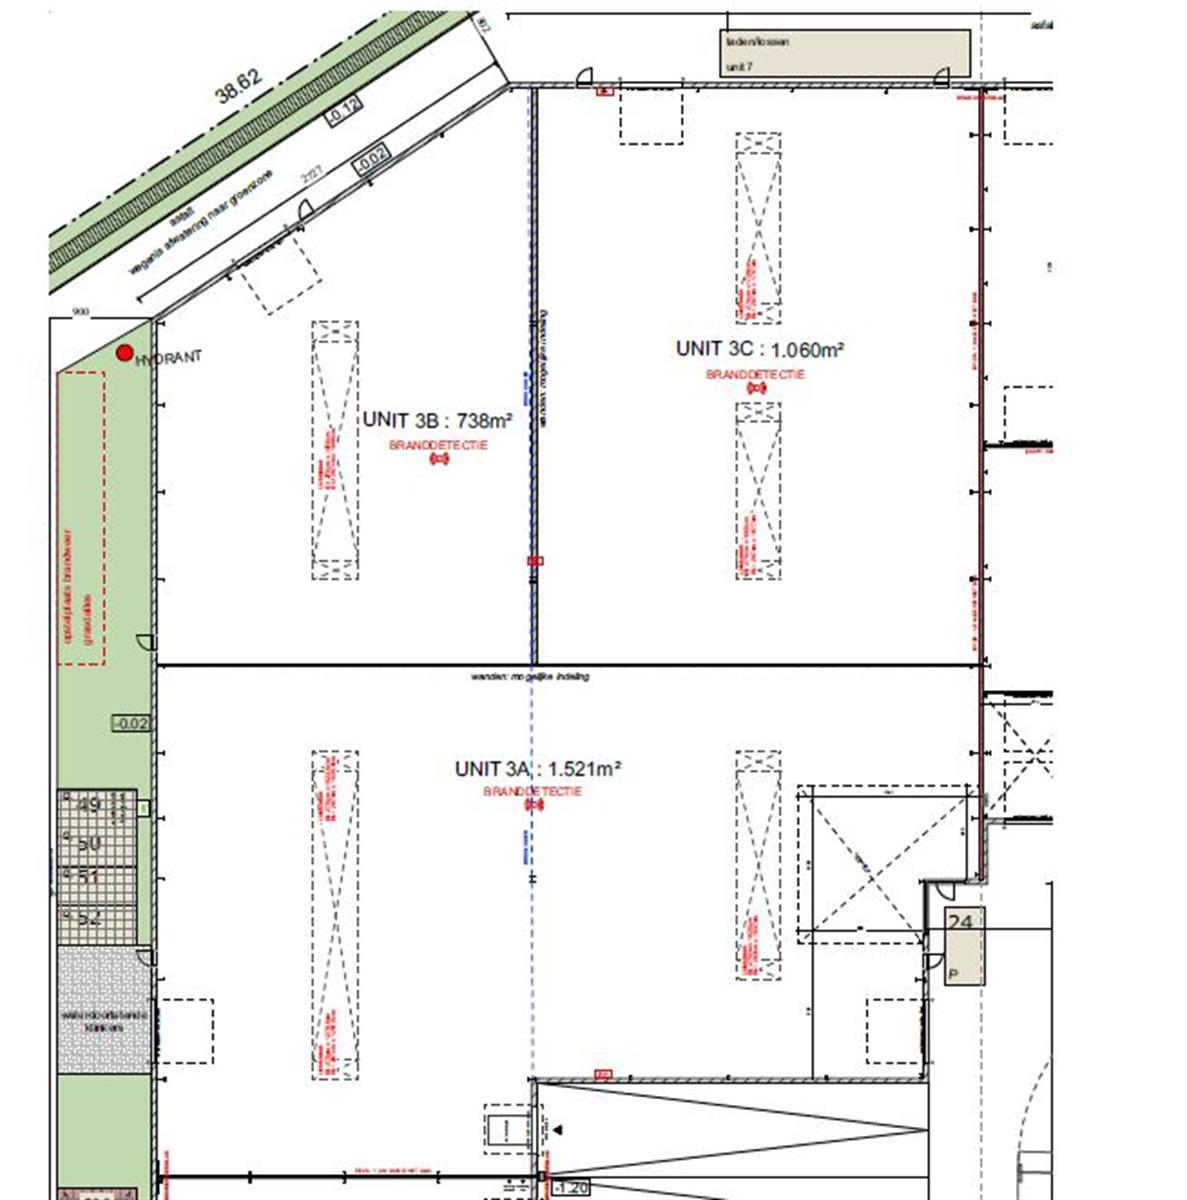 opslagplaats te huur Unit 3C - Geelseweg 7, 2200 Herentals, België 8